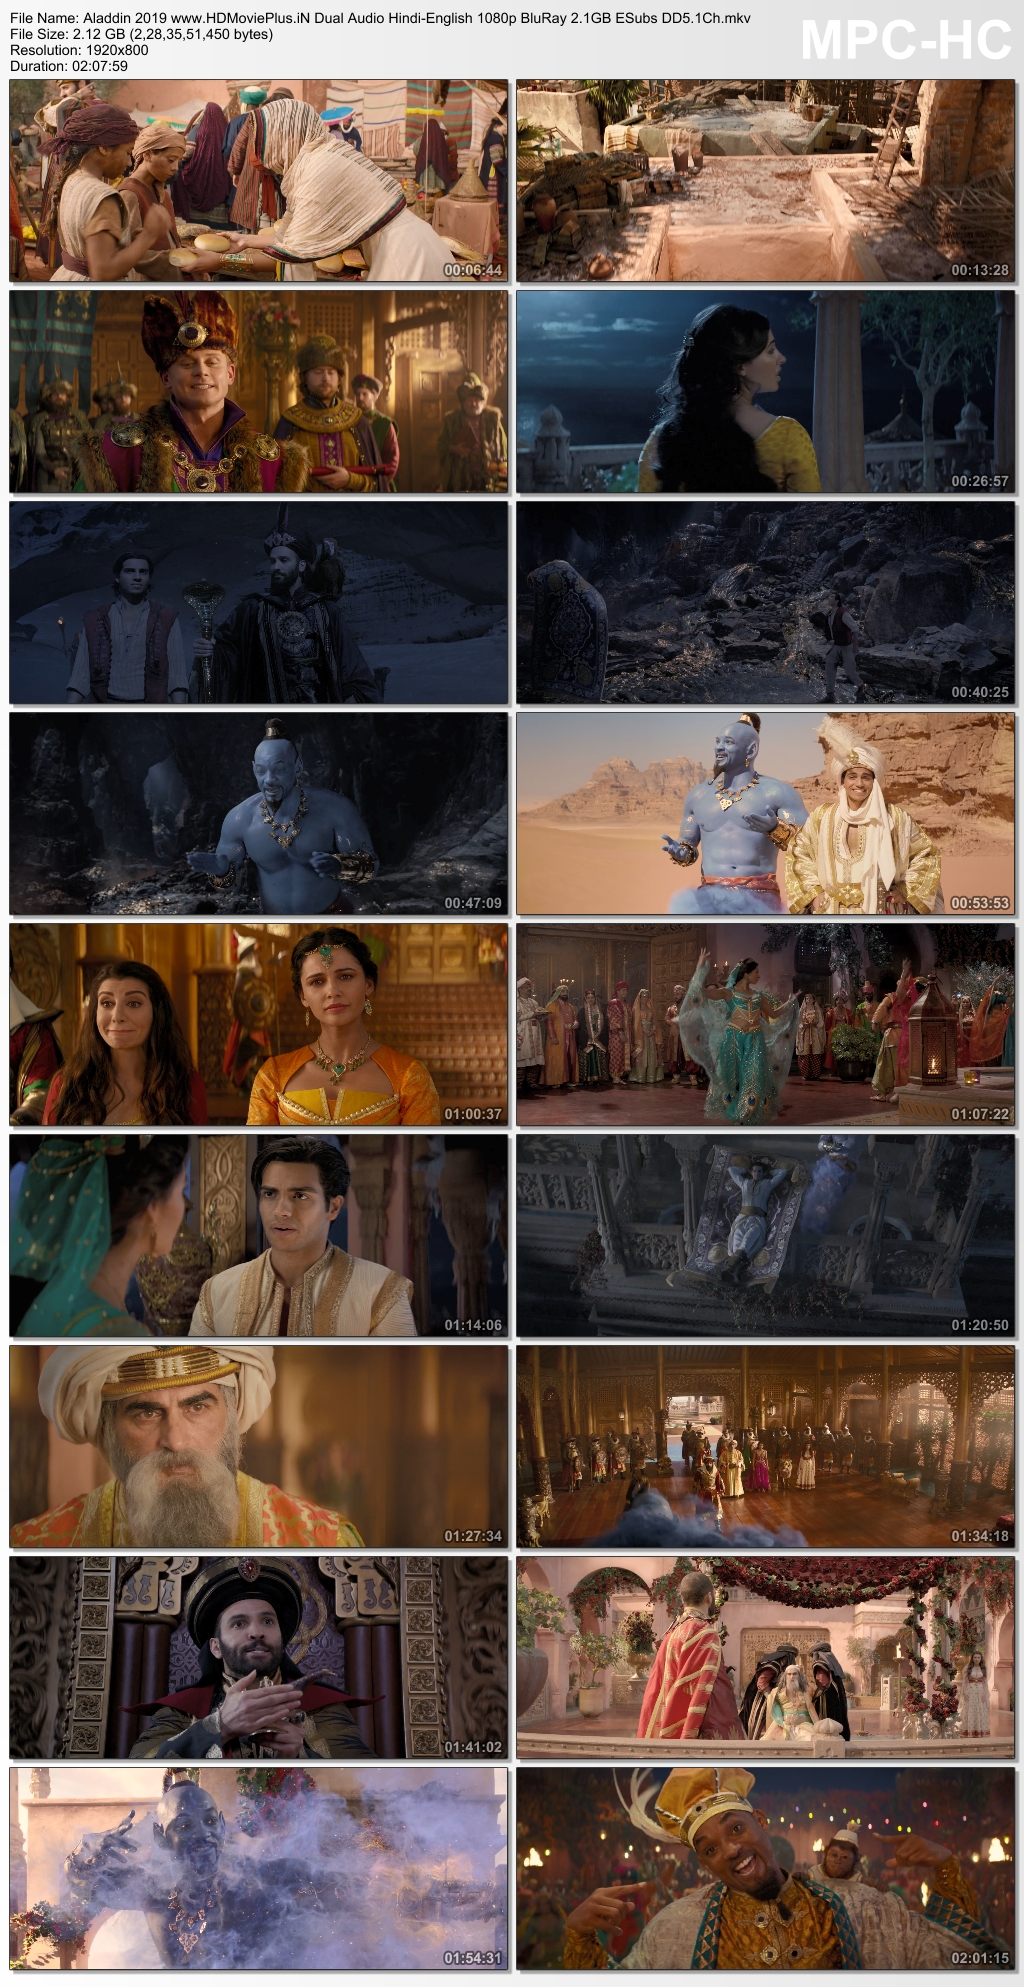 Aladdin 2019 Dual Audio